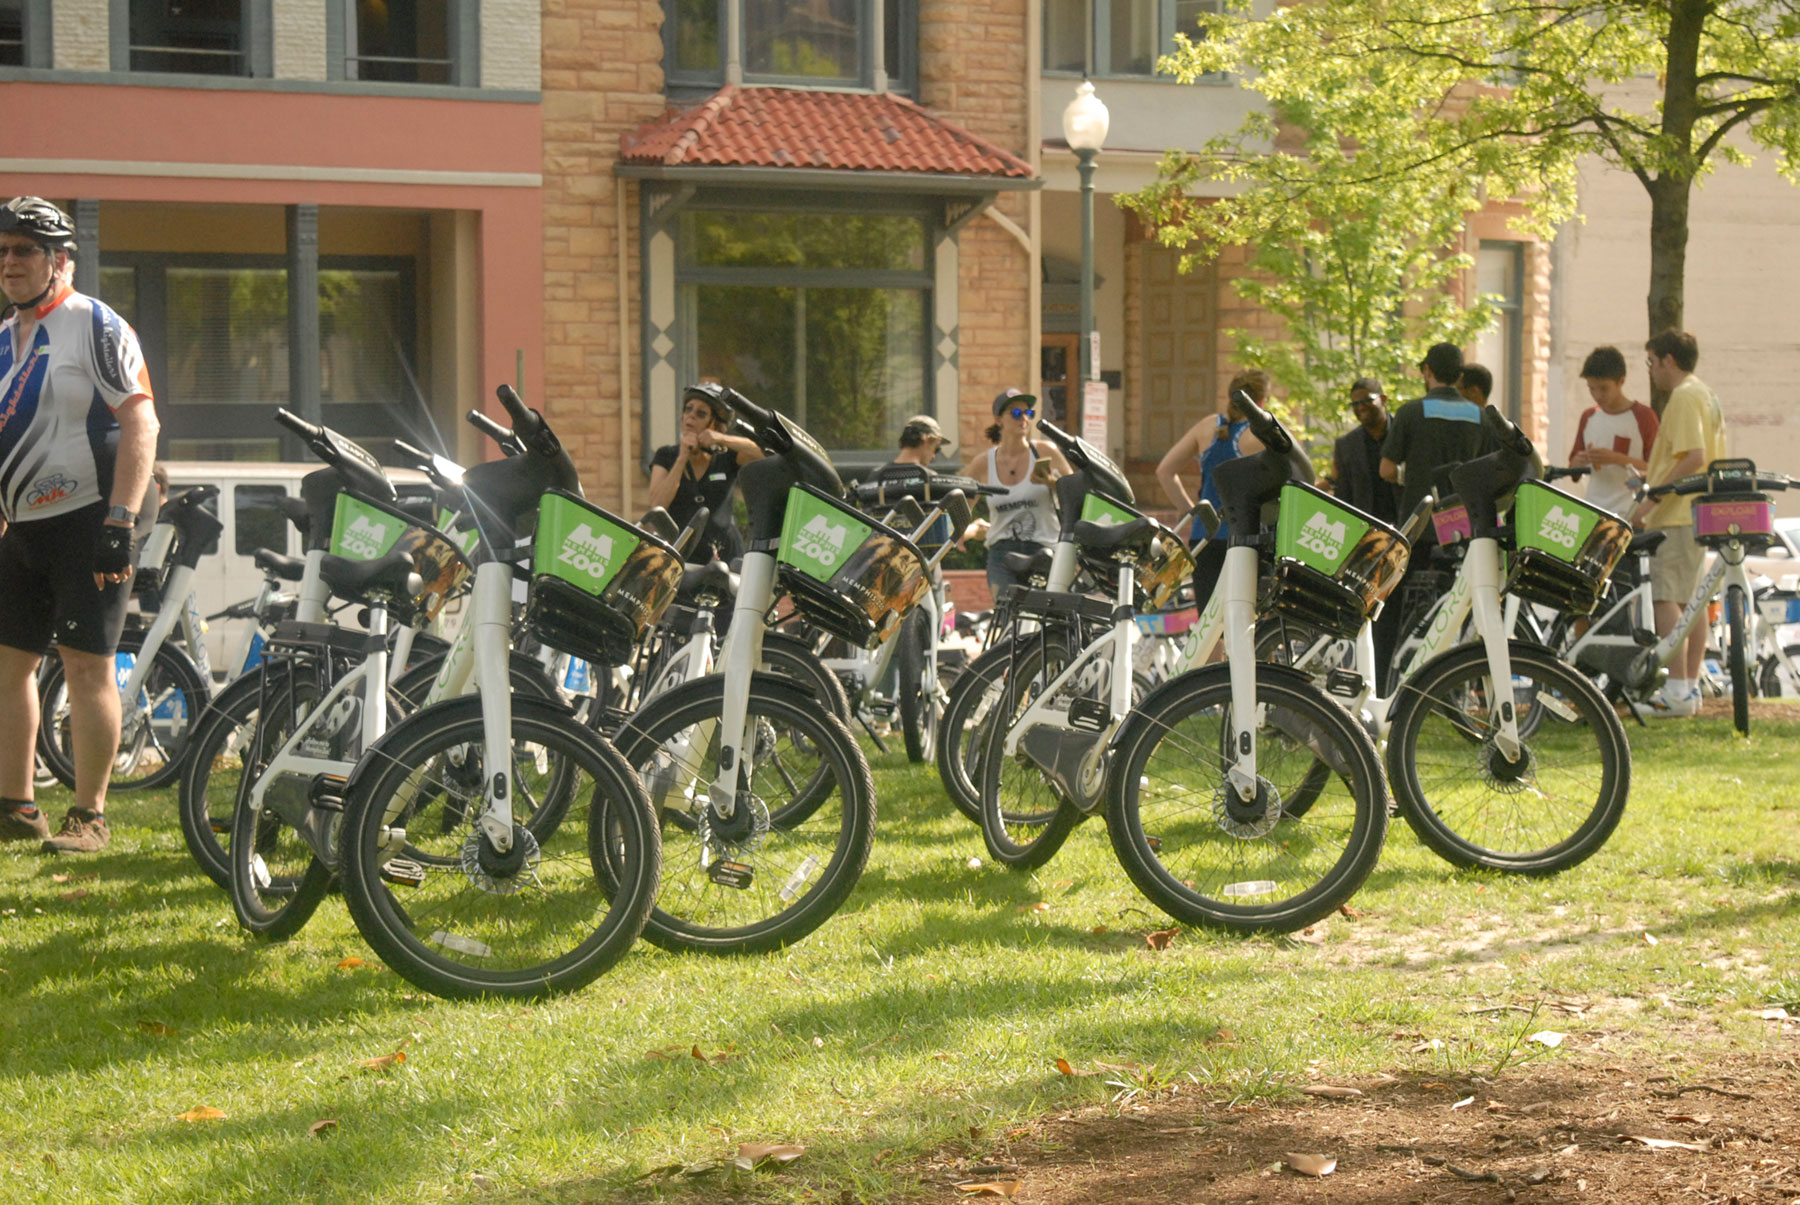 Explore-Bike-Share_Bike-Wrap_Memphis-Zoo_GraphicWrap_LSIGraphics_Memphis-TN ..